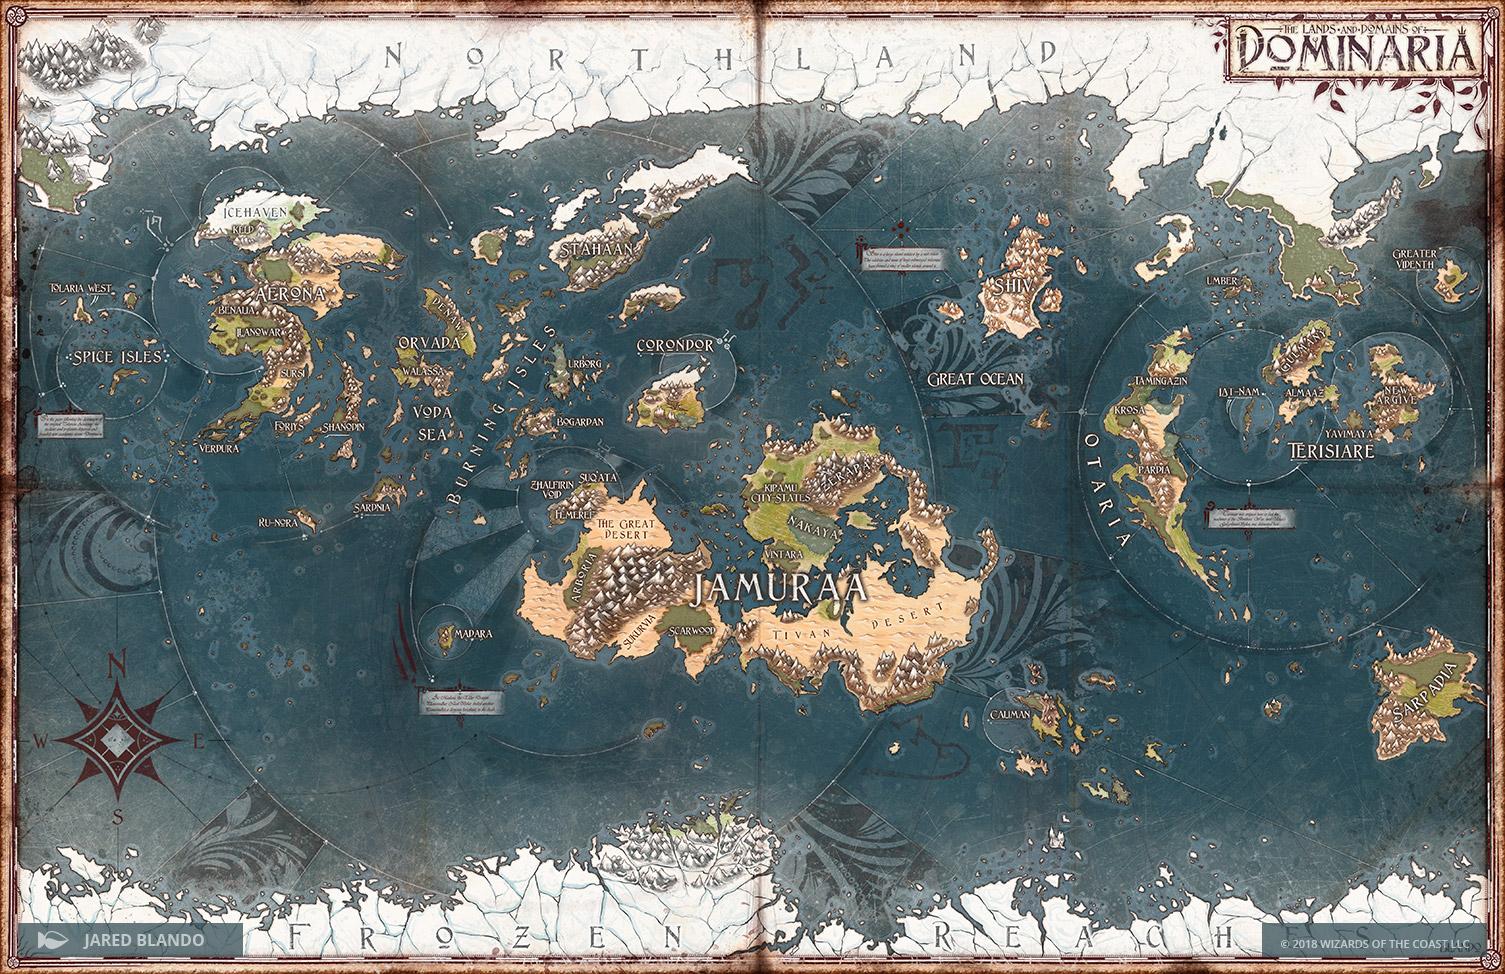 Dominaria Map